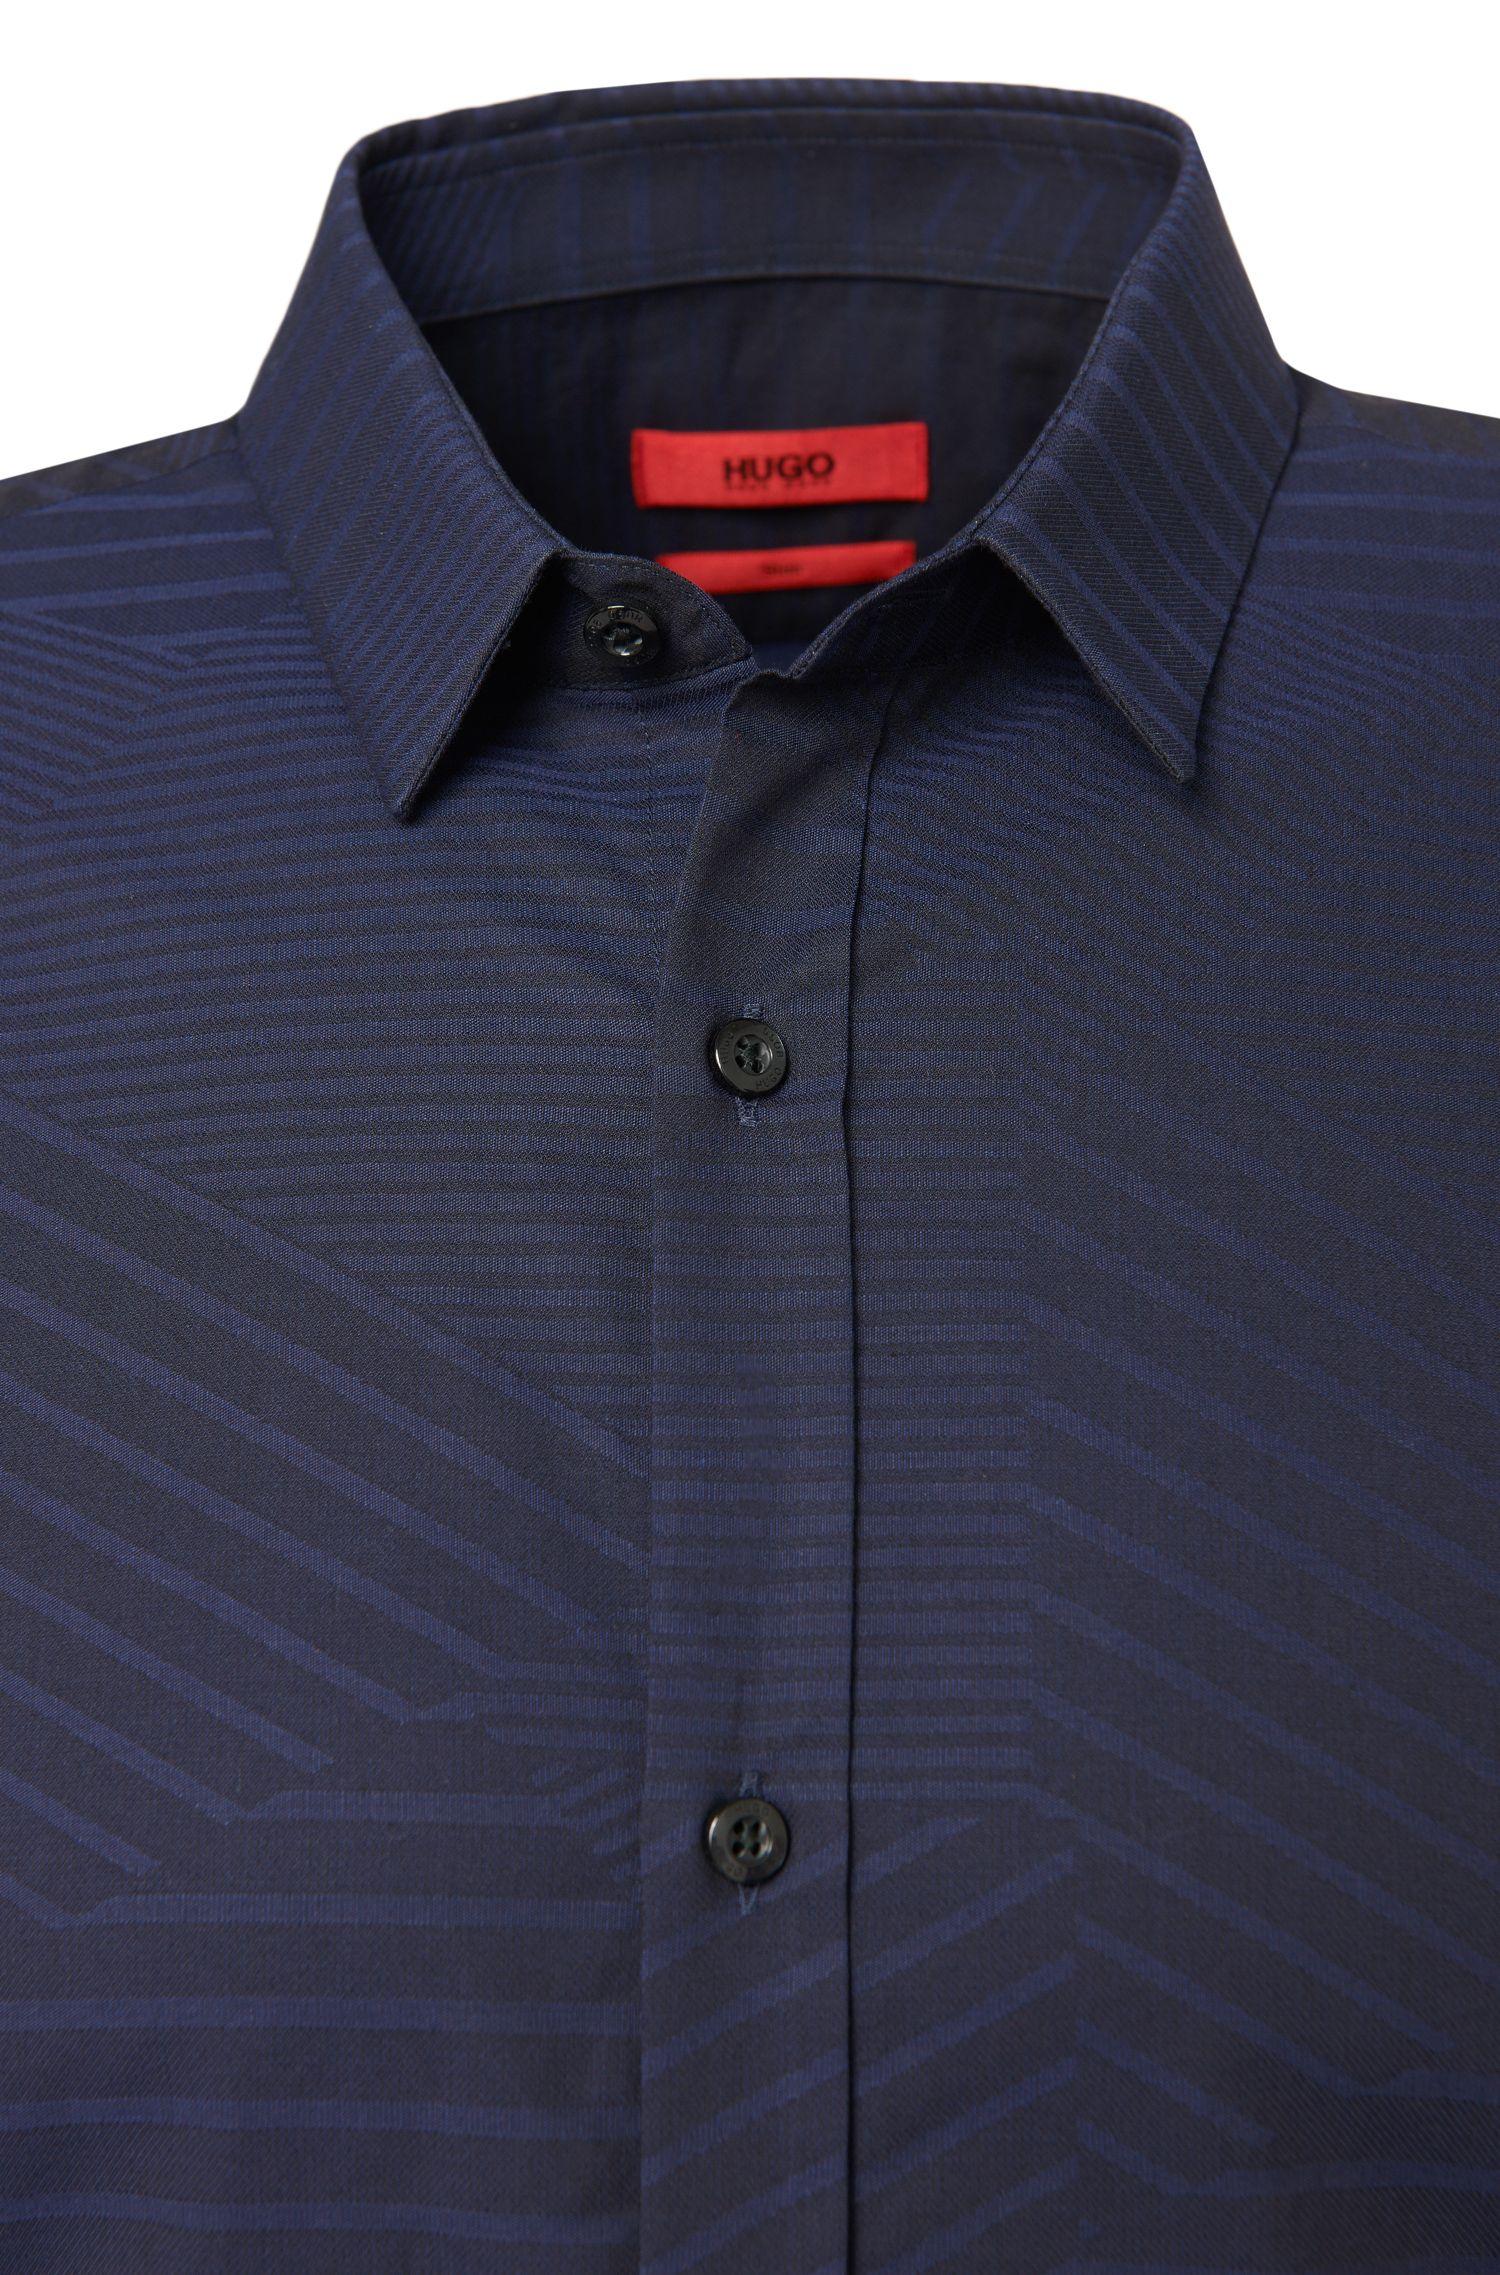 Gemustertes Slim-Fit Hemd aus reiner Baumwolle: 'Ero3'